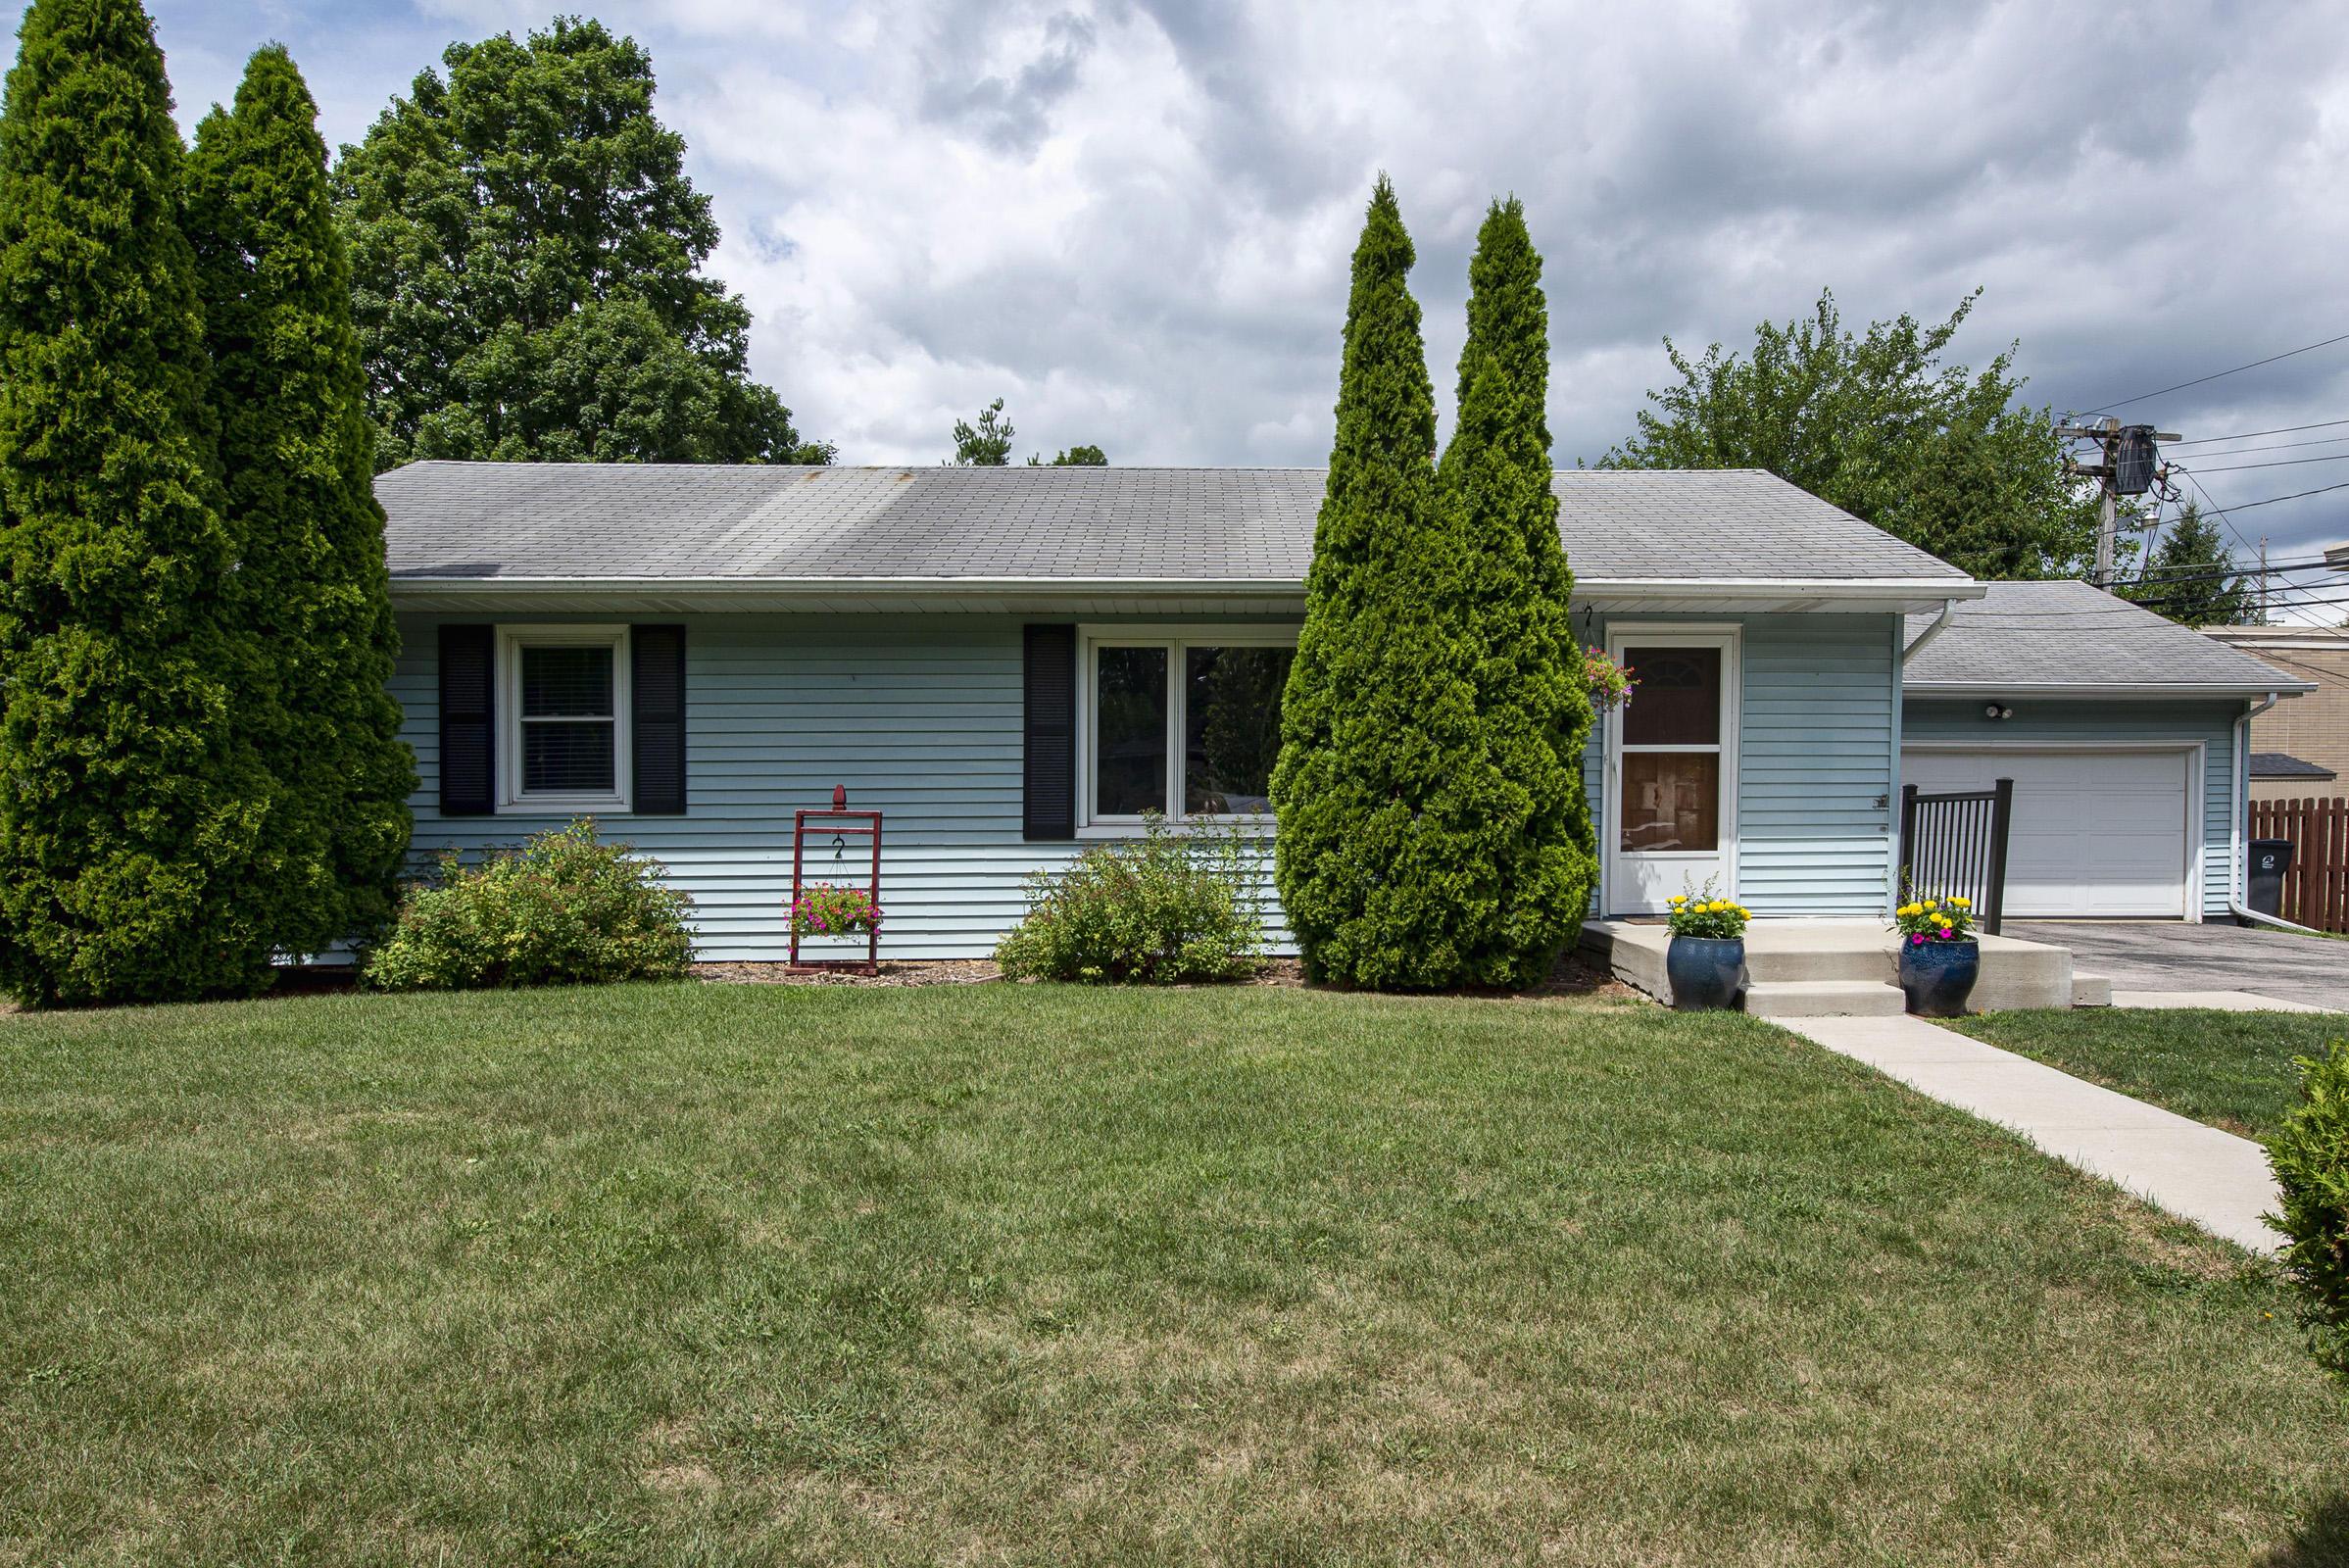 614 Lemira Ave, Waukesha, Wisconsin 53188, 3 Bedrooms Bedrooms, 5 Rooms Rooms,2 BathroomsBathrooms,Single-Family,For Sale,Lemira Ave,1702191